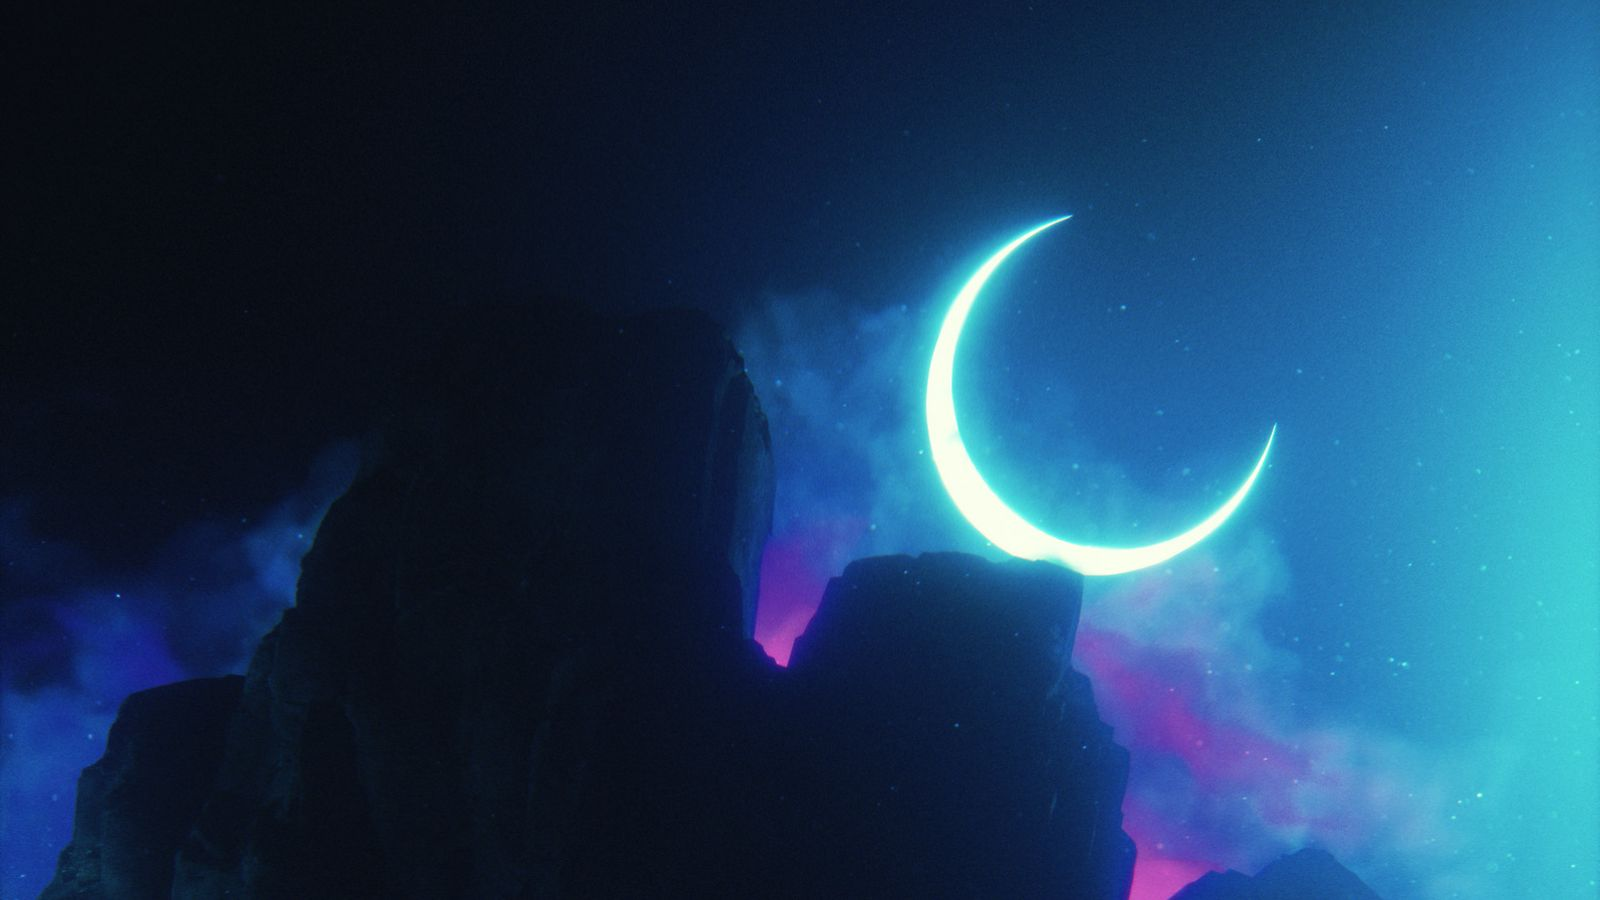 1600x900 Wallpaper rock, neon, smoke, moon, light, bright